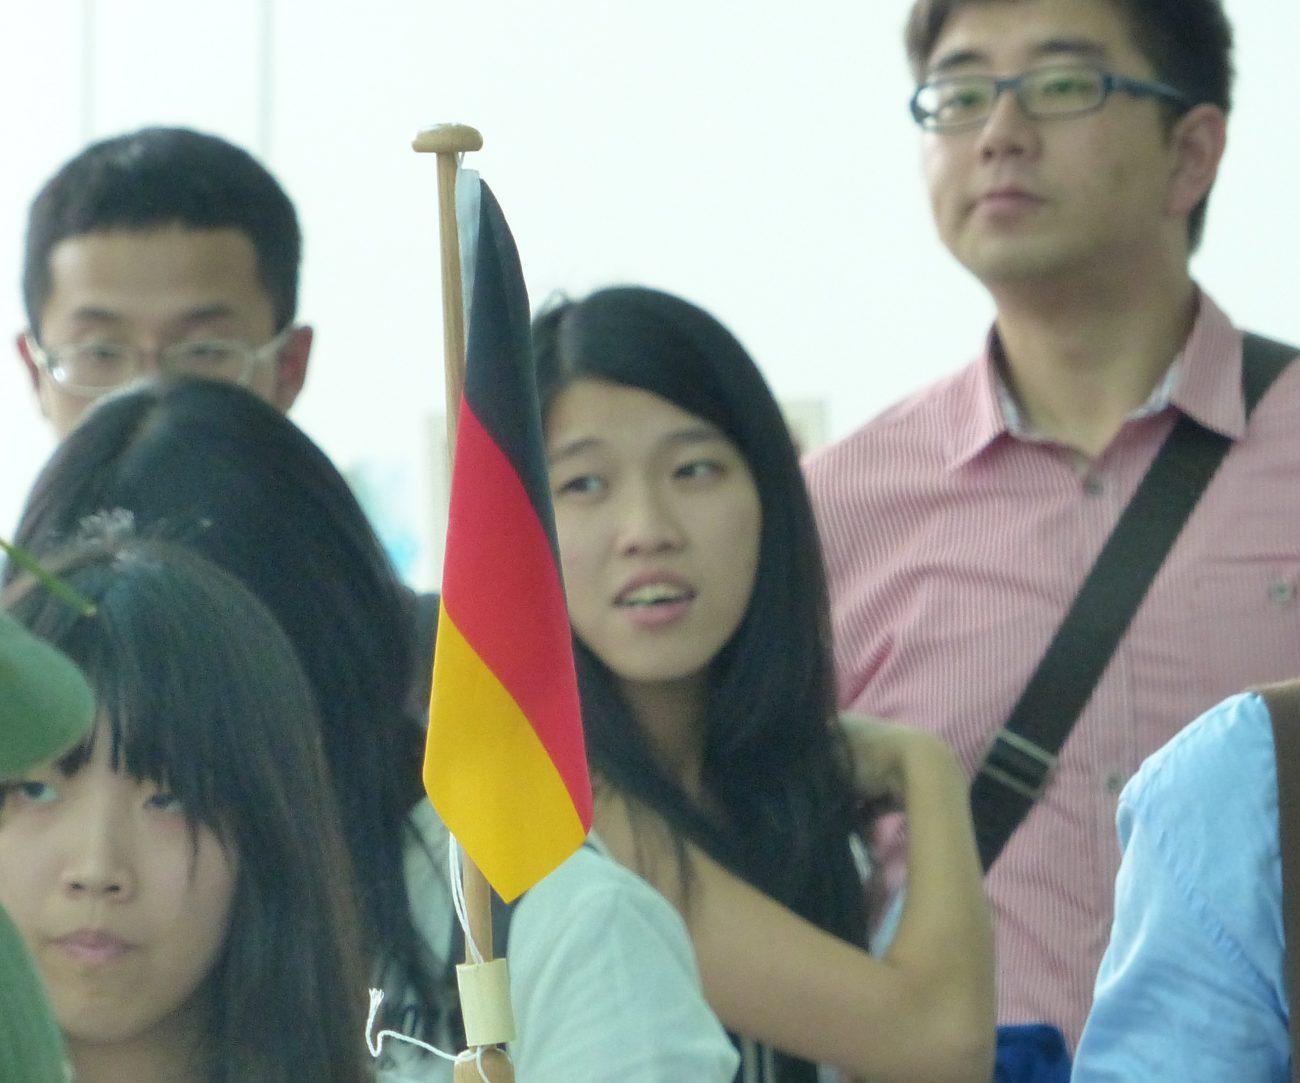 Studenten aus Taiwan